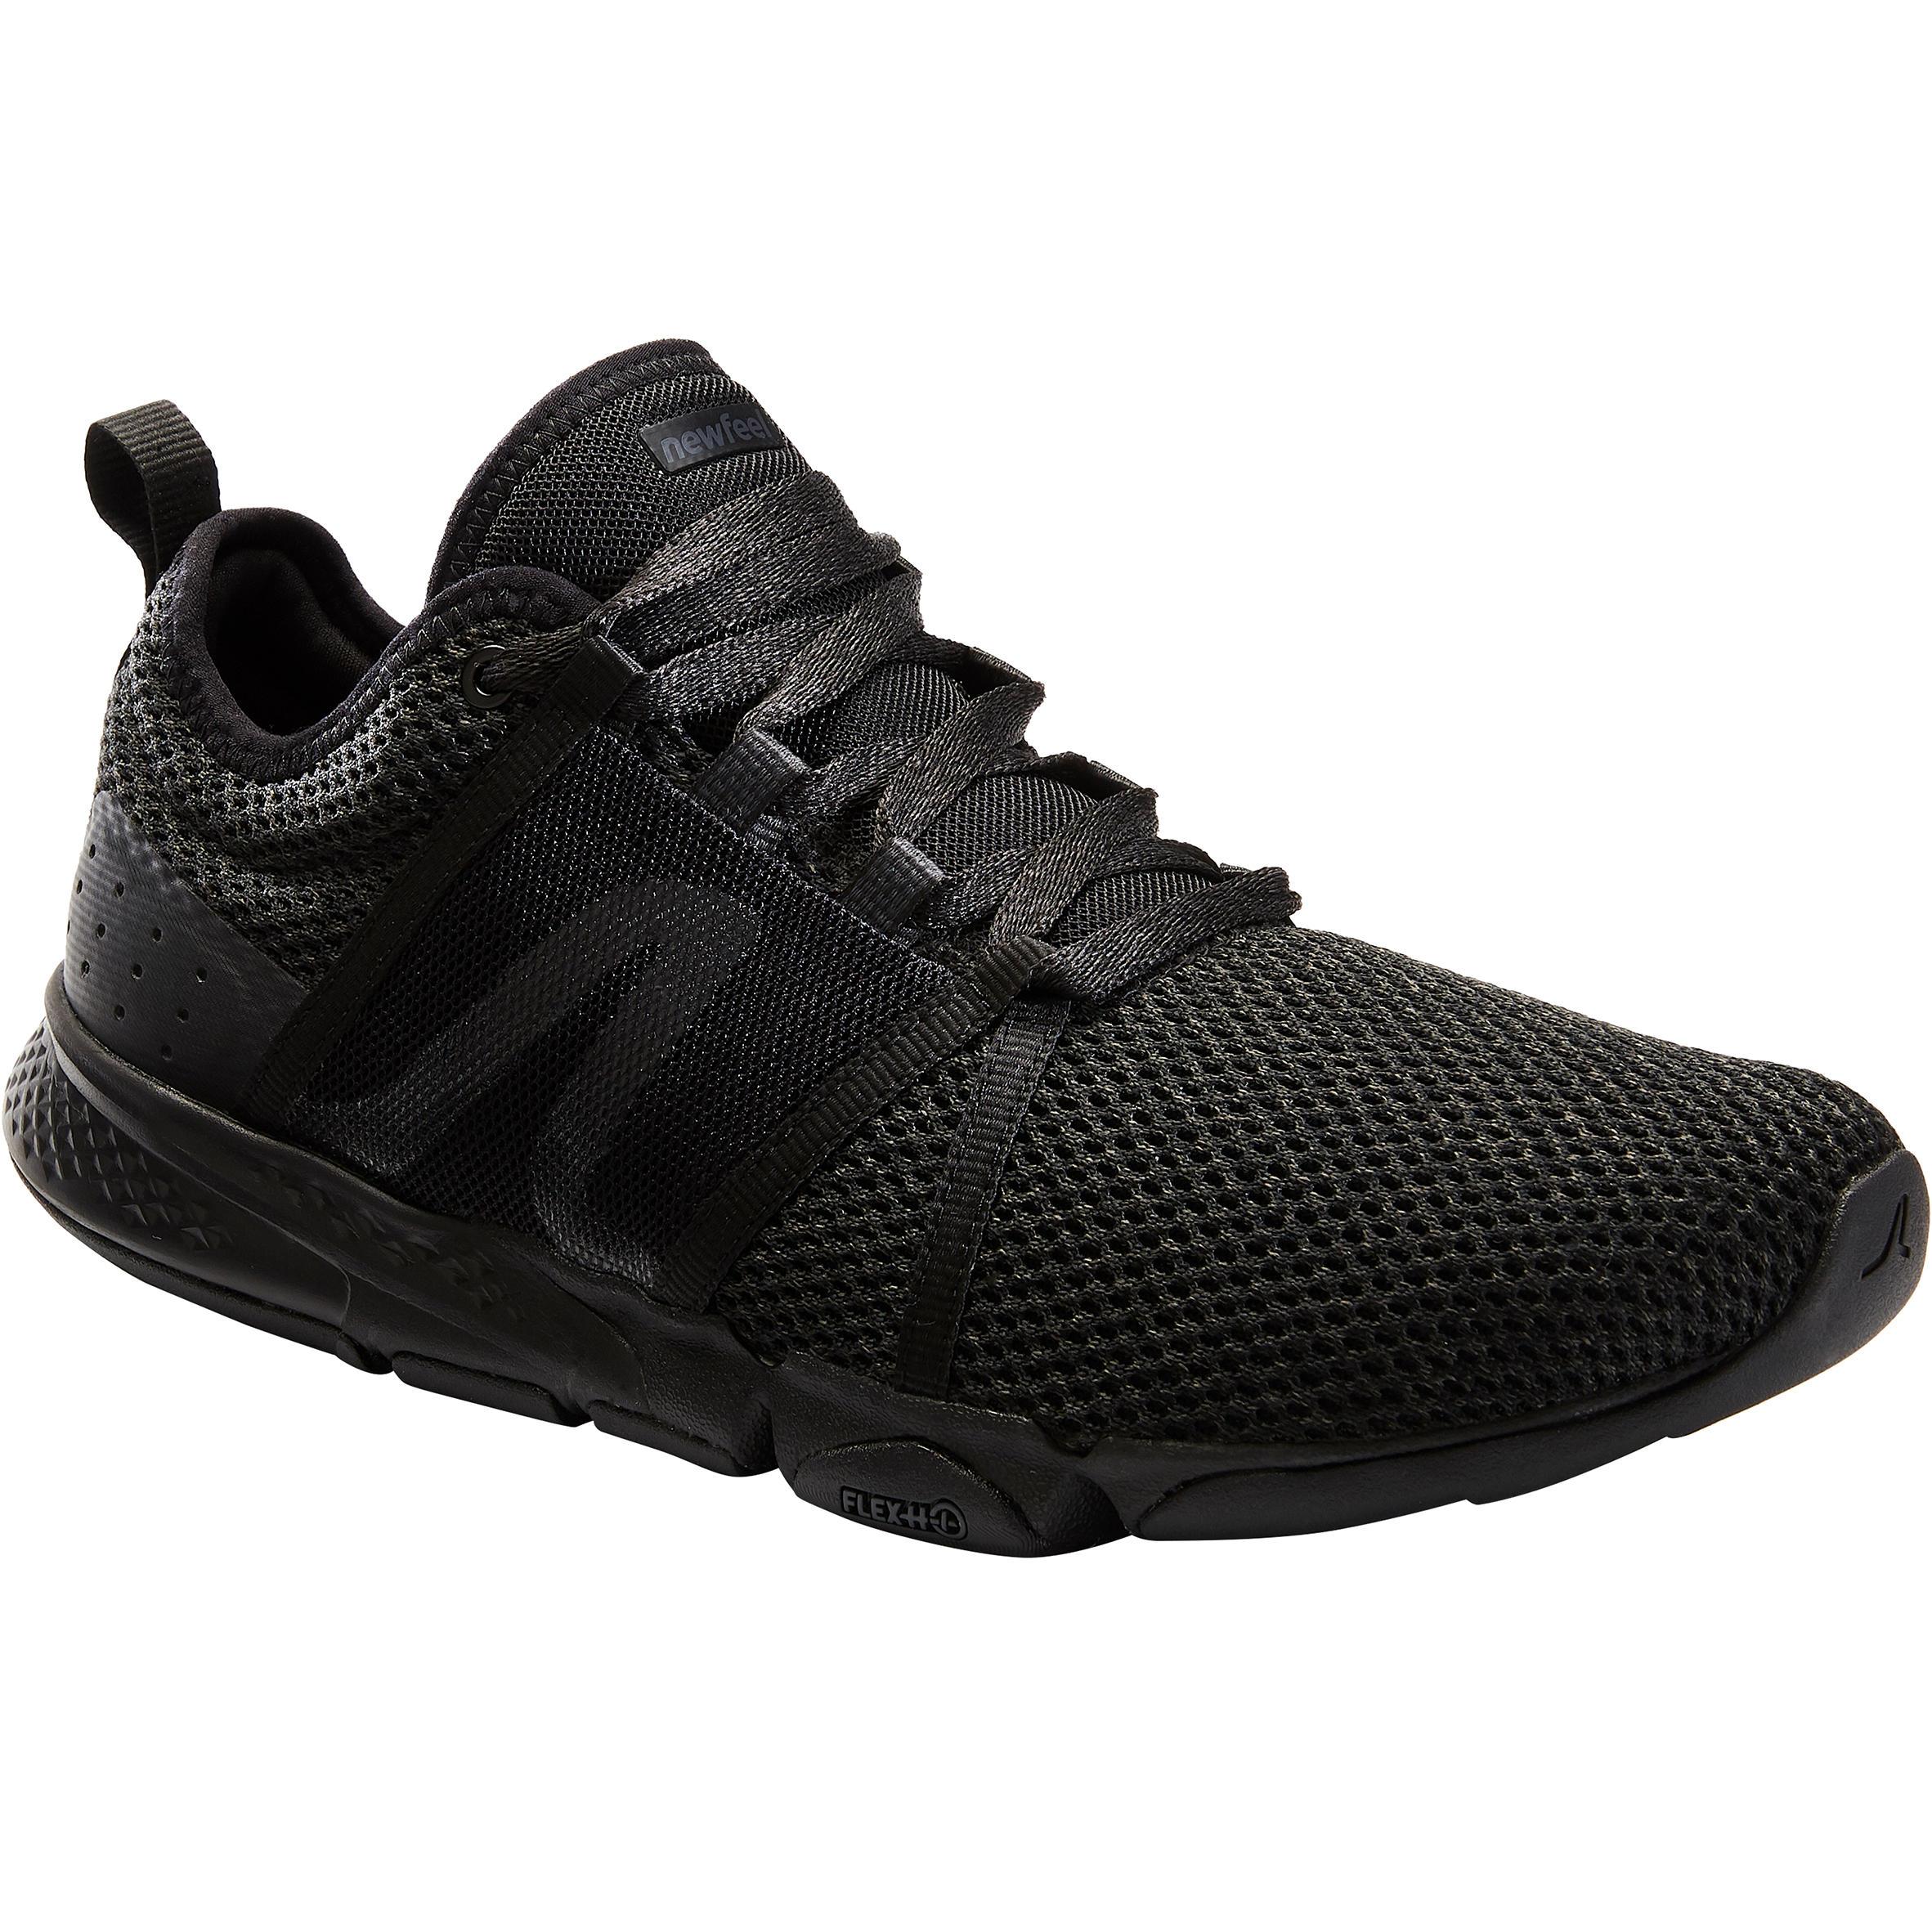 Newfeel Chaussures marche sportive homme PW 540 Flex-H+ full noir - Newfeel